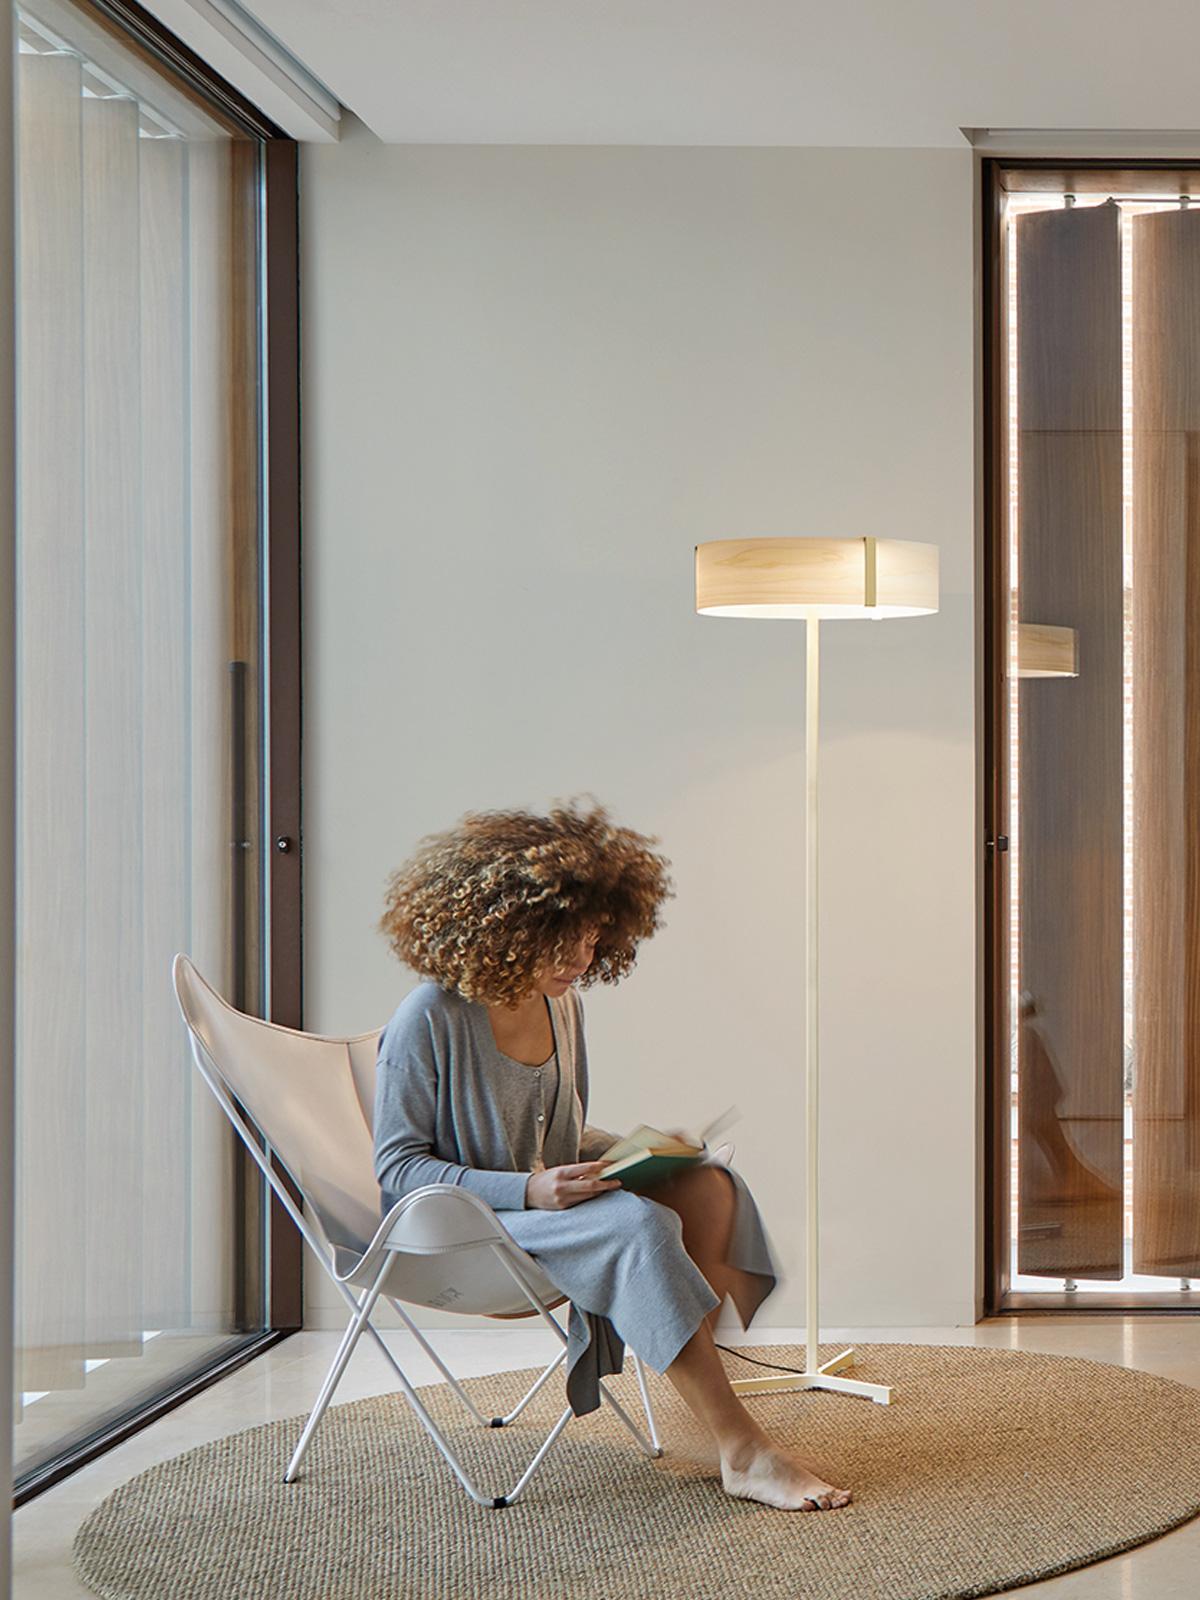 DesignOrt Blog: Alles über LZF Lamps Thesis F Stehleuchte LZF Deko